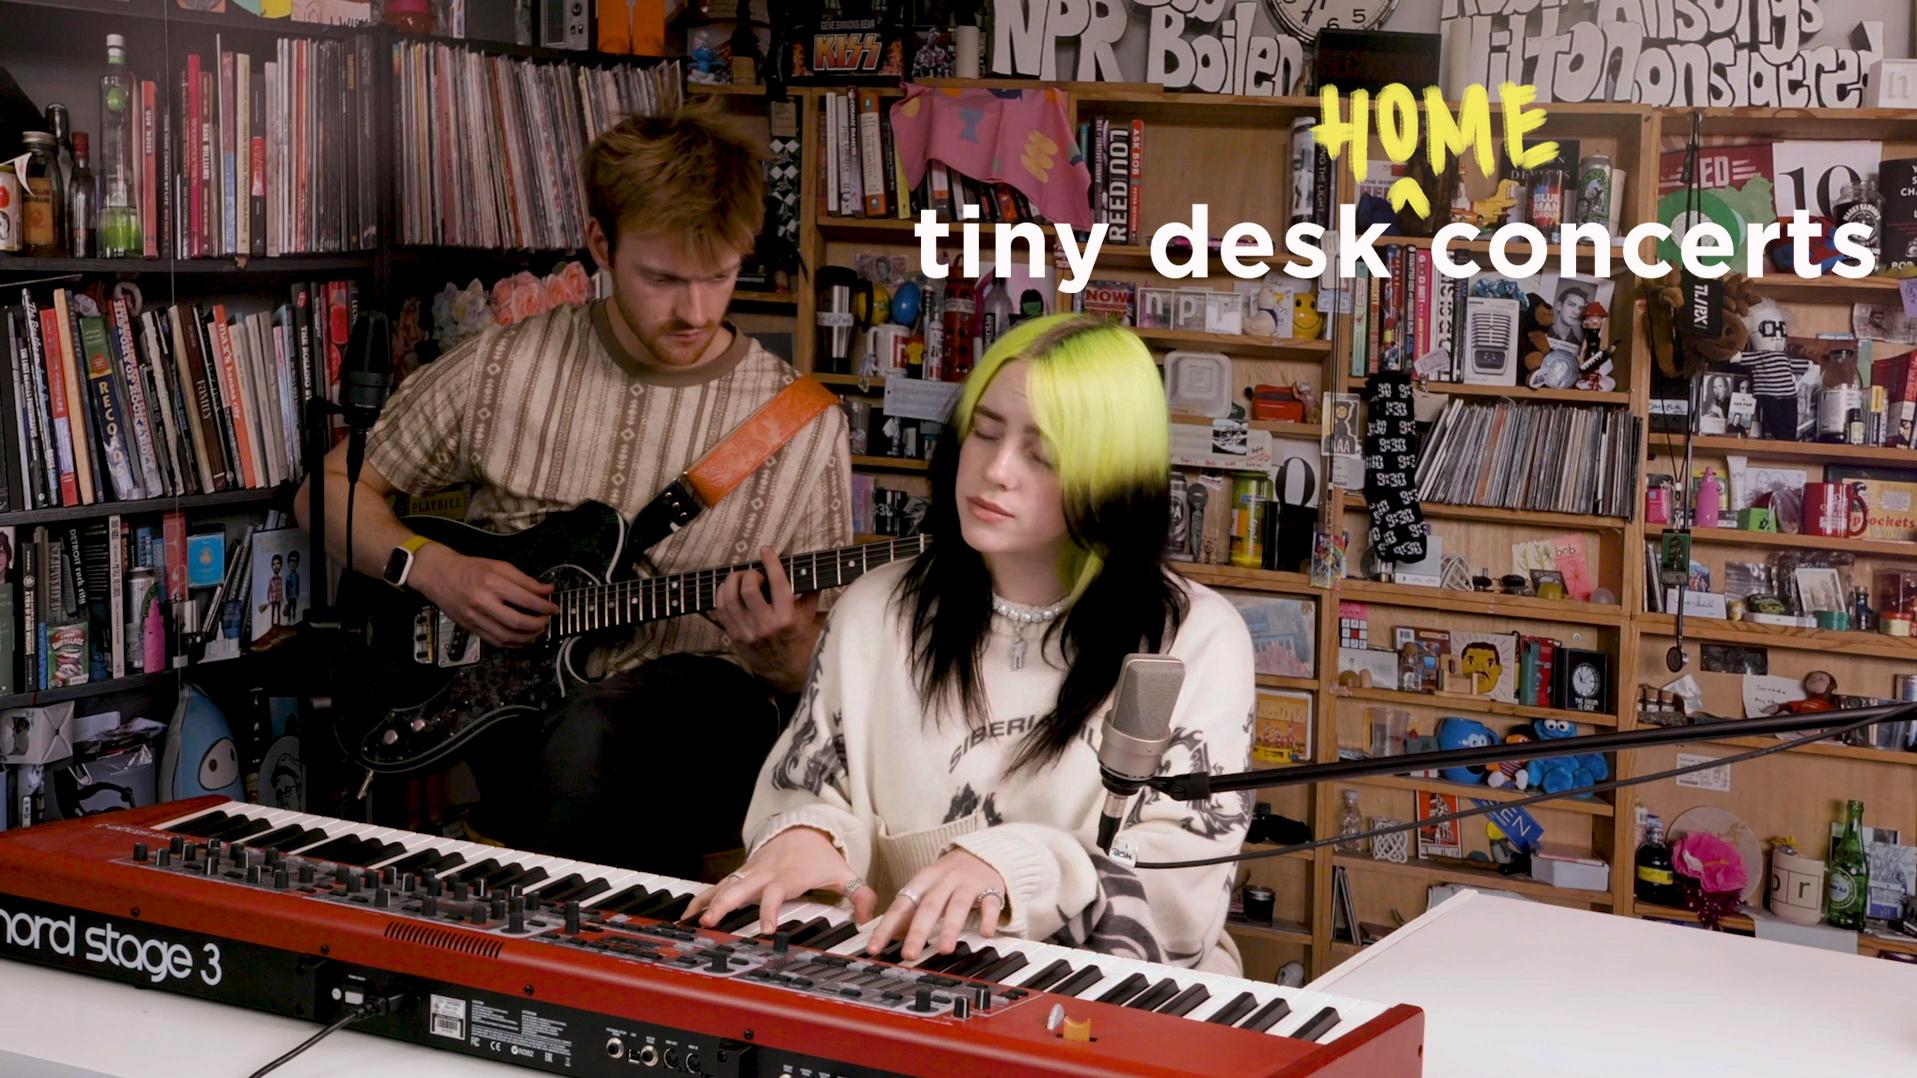 Watch Billie Eilish Perform A Tiny Desk Concert (From Home) : NPR